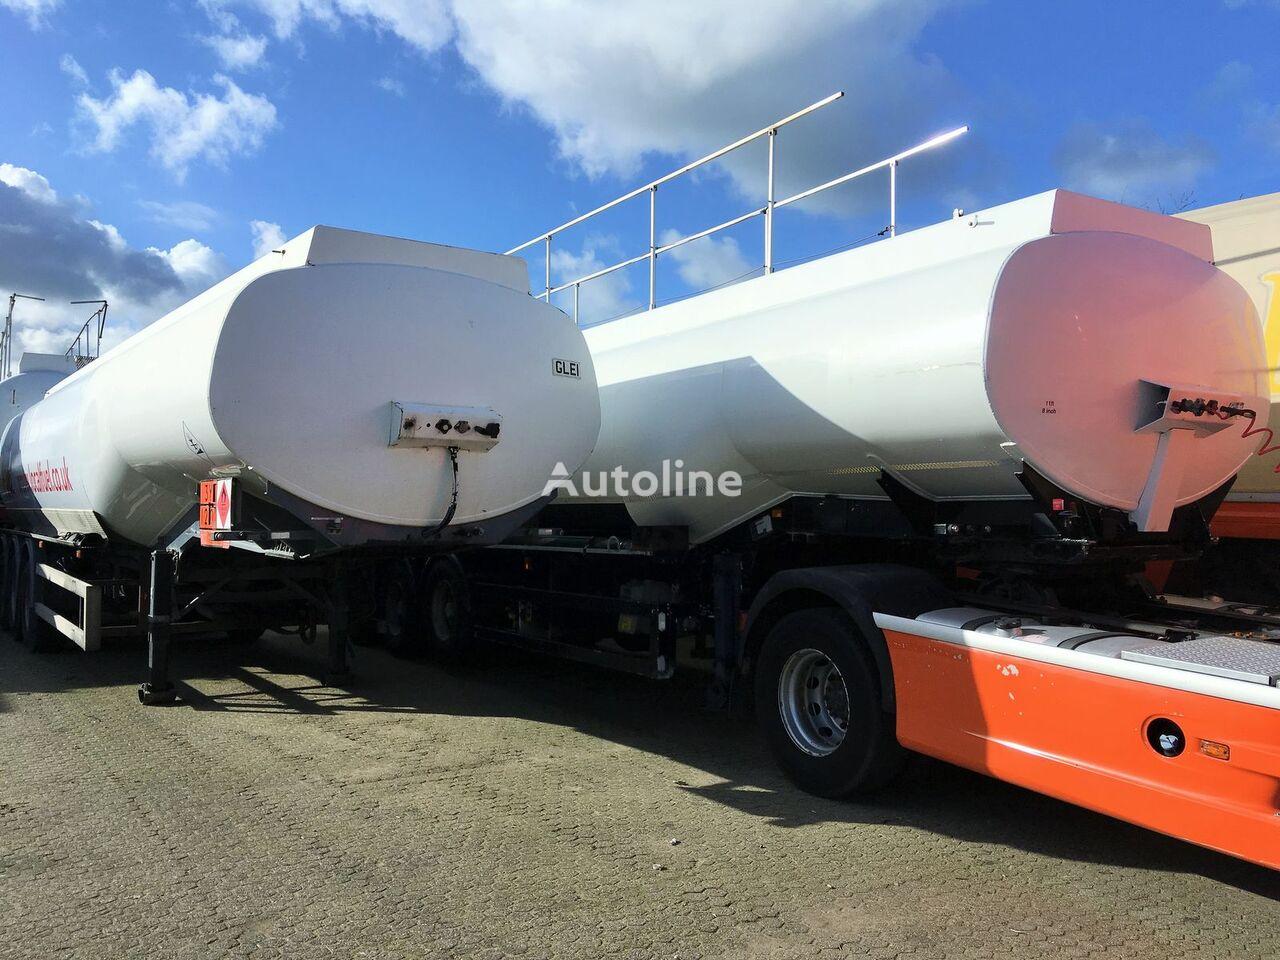 FRUEHAUF Fuel 40.400 ltr Benzin-Diesel LGBF fuel tank trailer